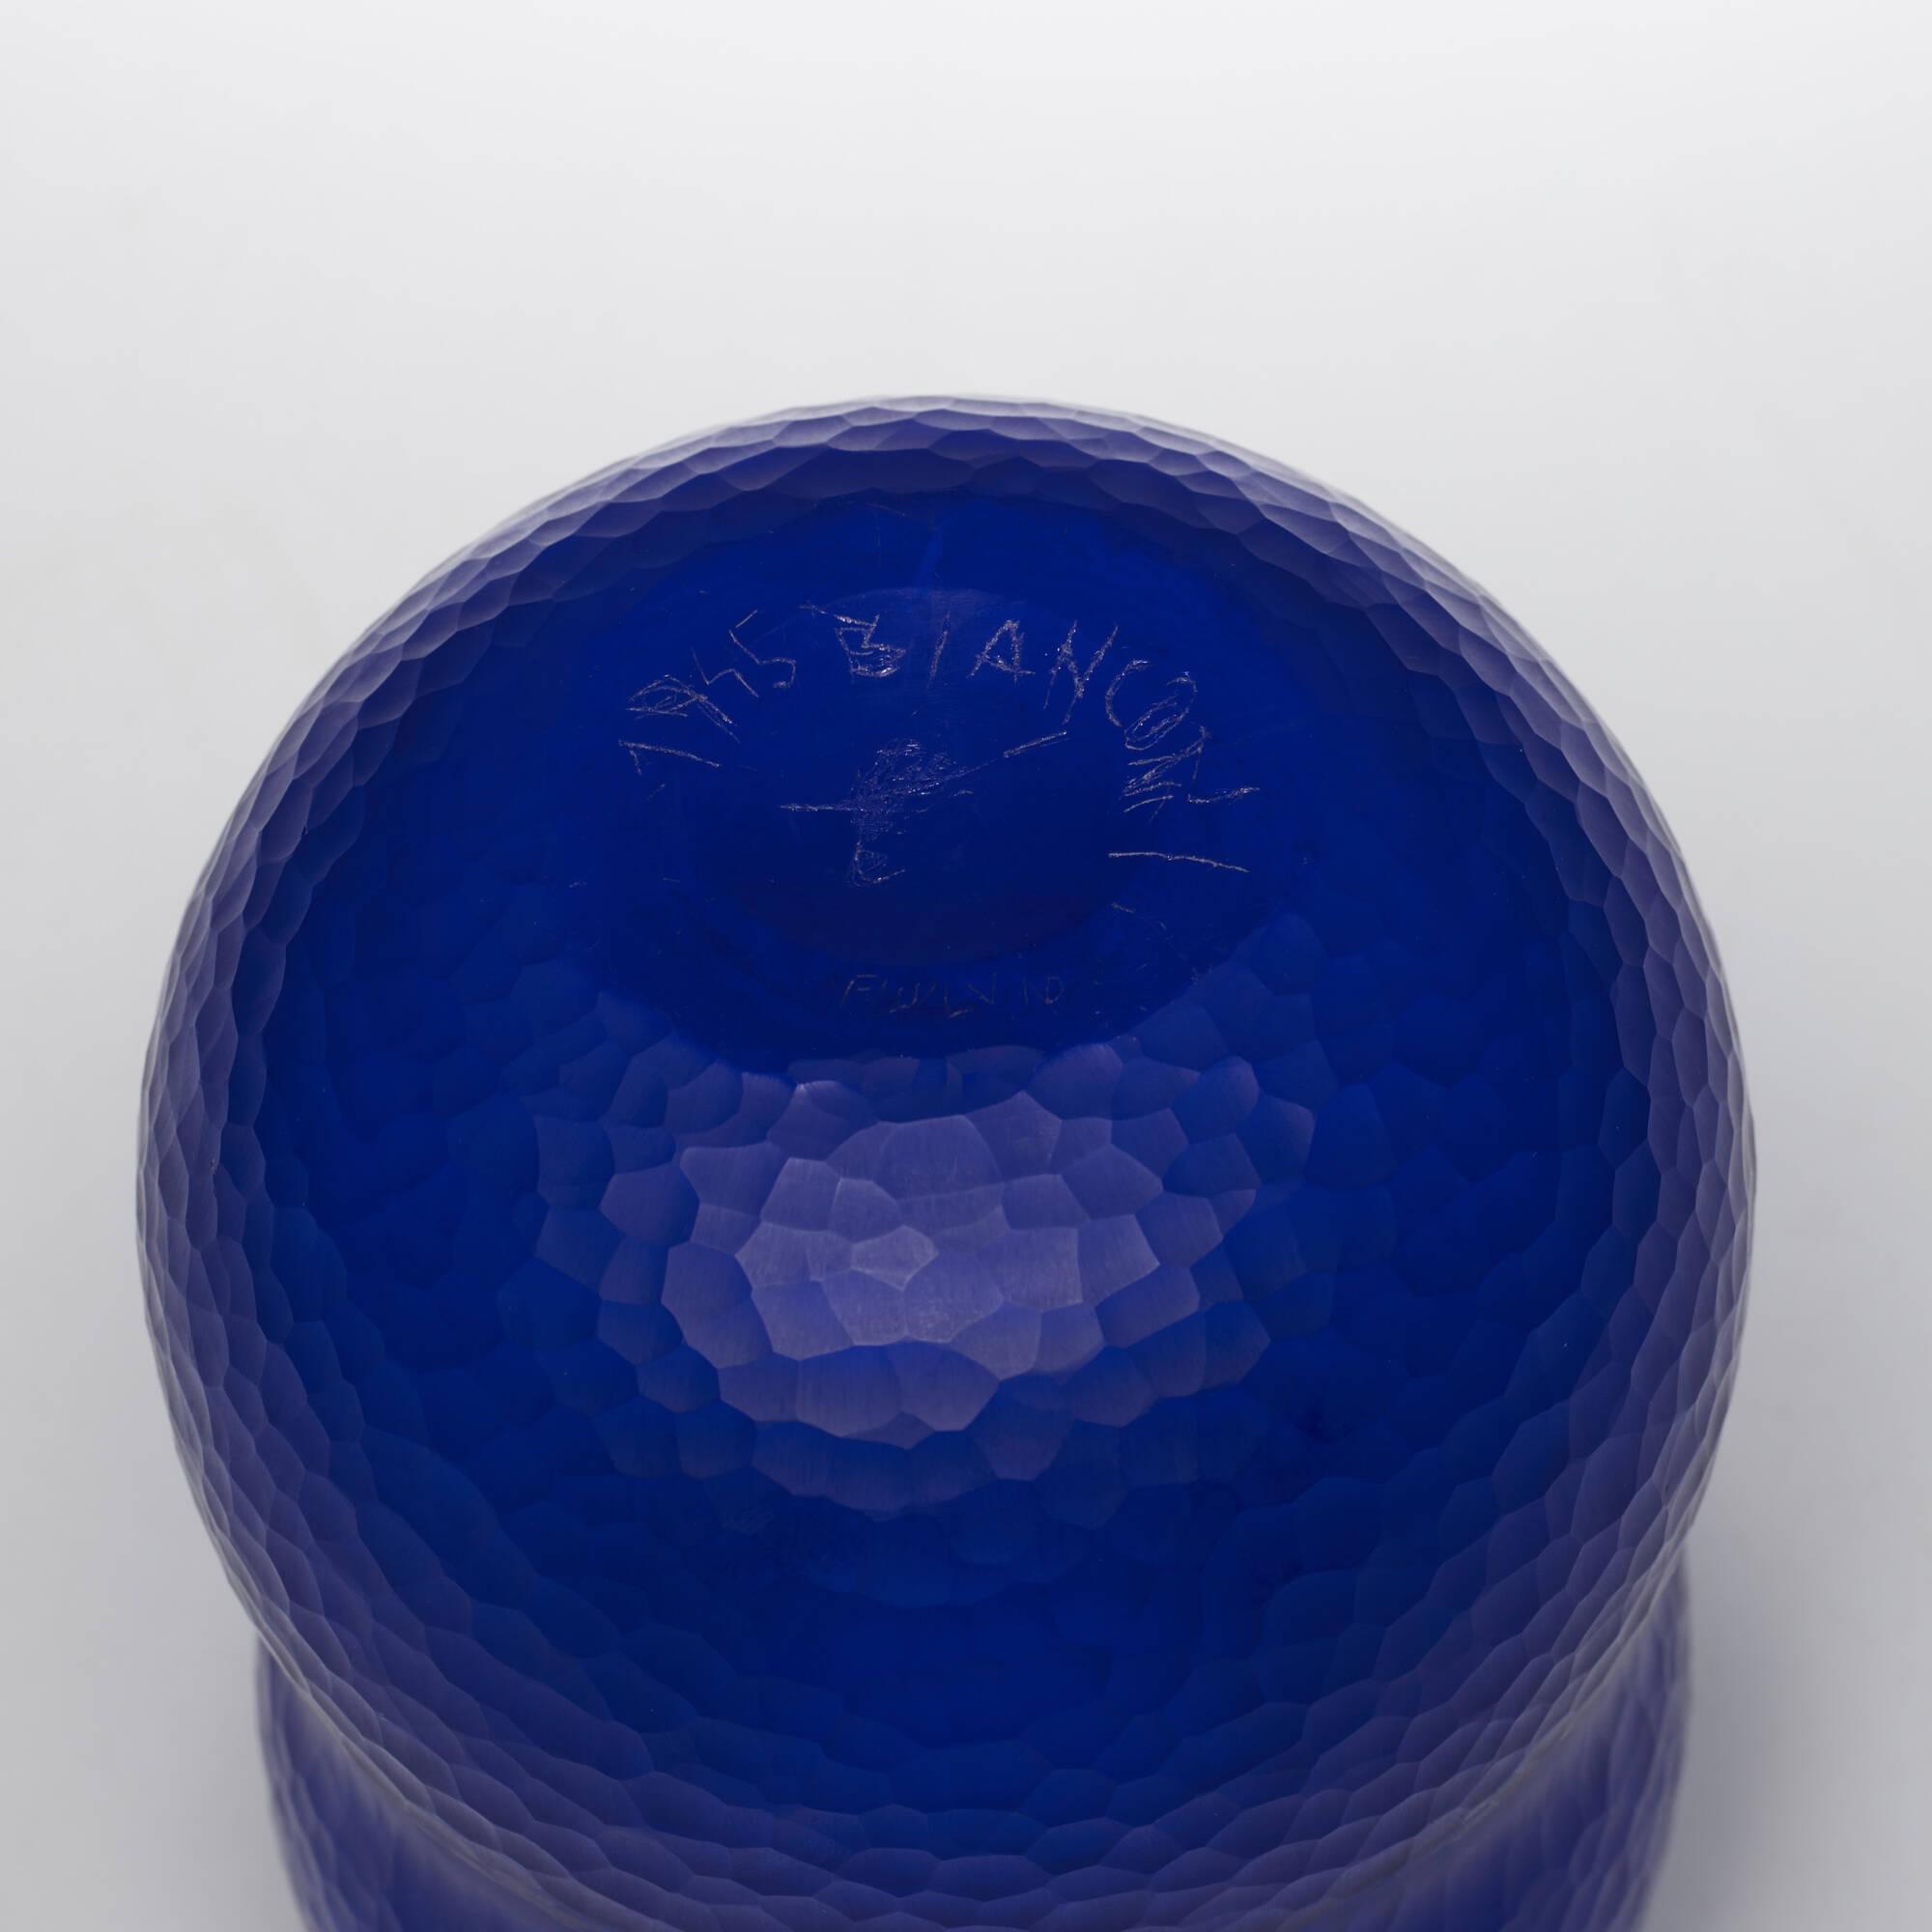 50 carlo scarpa battuto vase masterworks 25 may 2017 50 carlo scarpa battuto vase 3 of 3 floridaeventfo Image collections